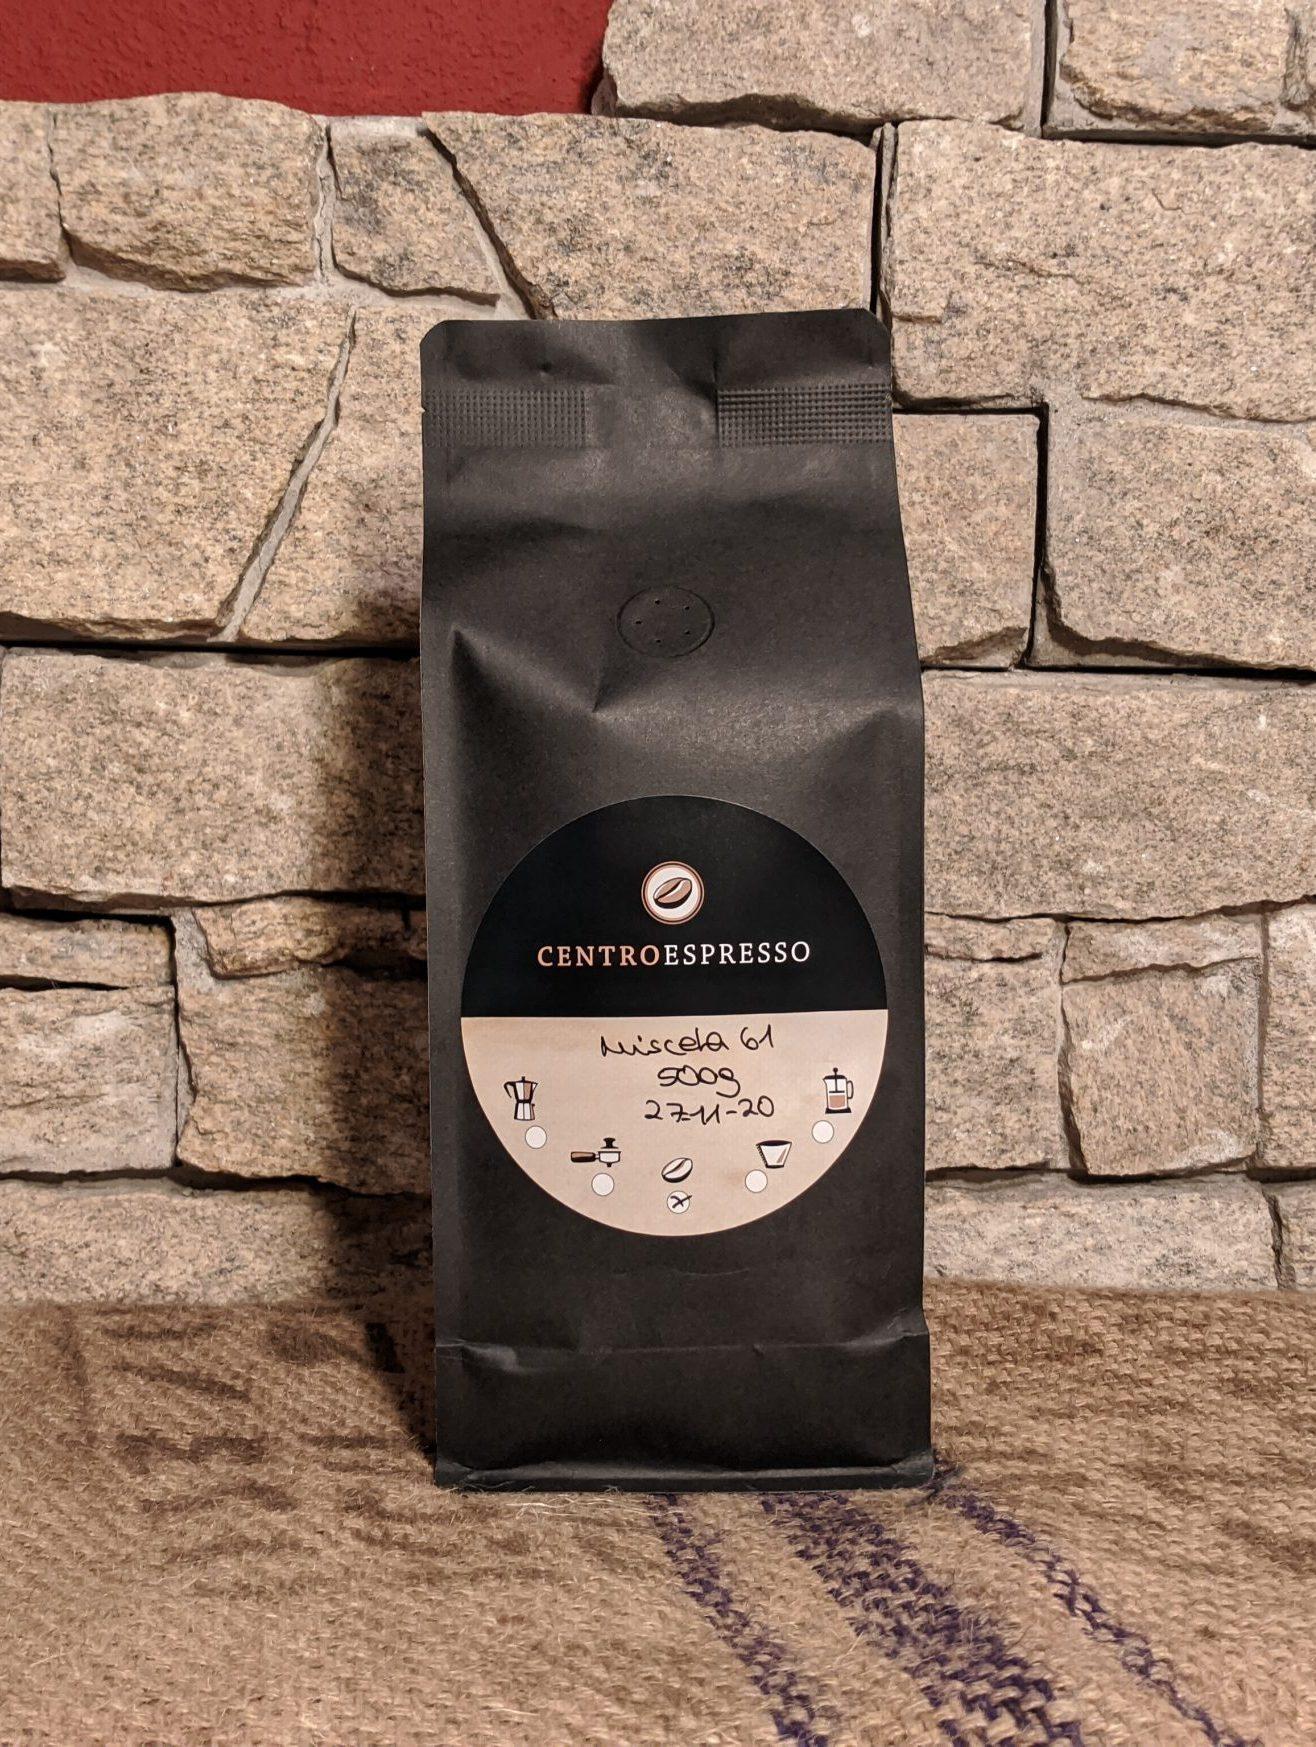 500 g Centro Espresso miscela 61 organic